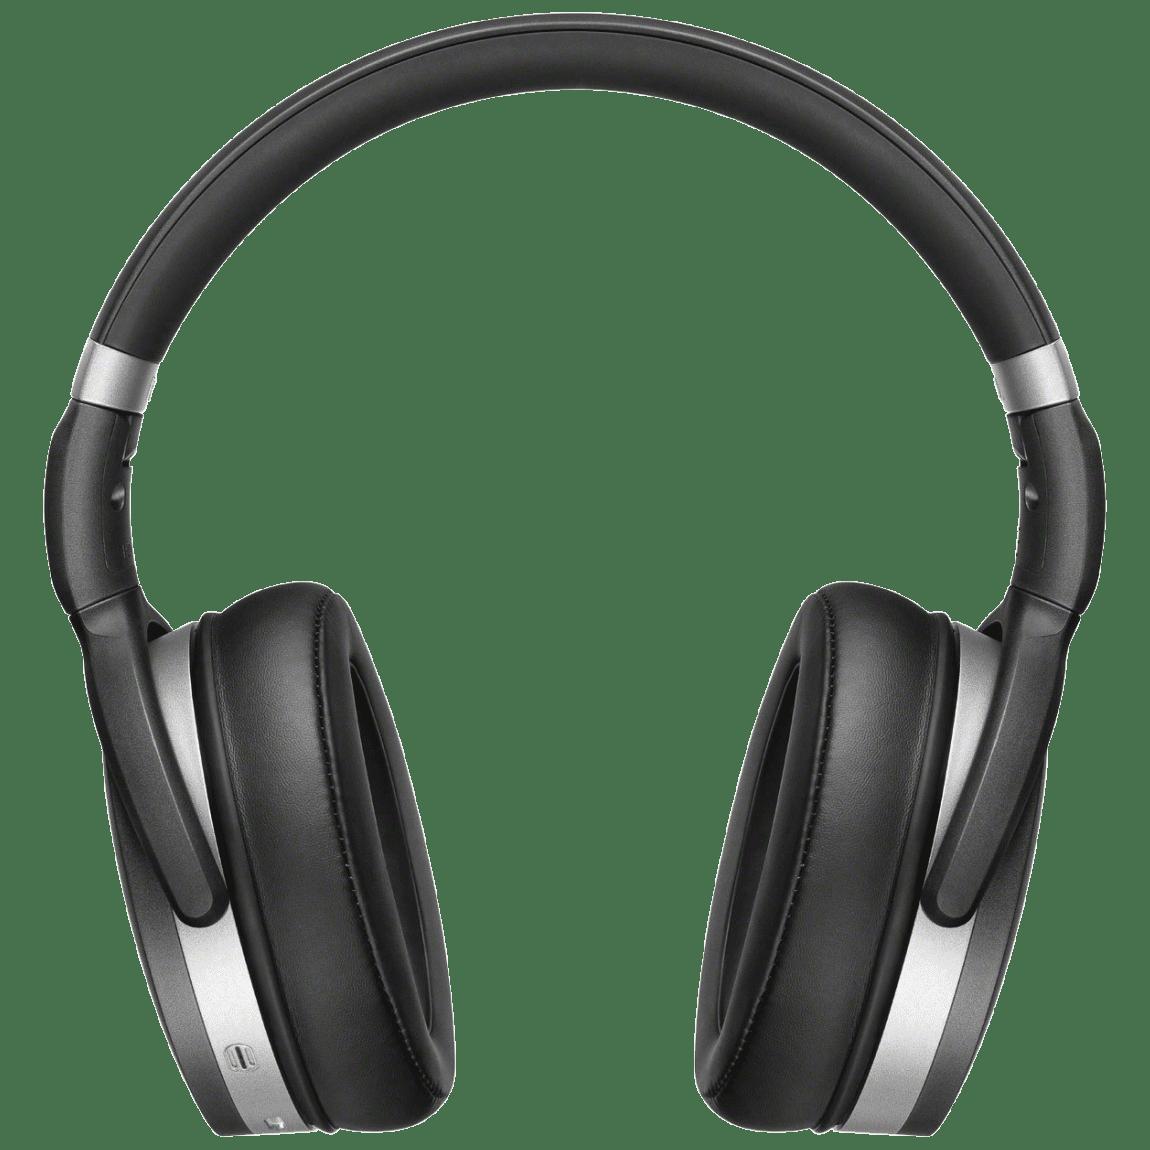 Sennheiser Headphone Transparent Picture